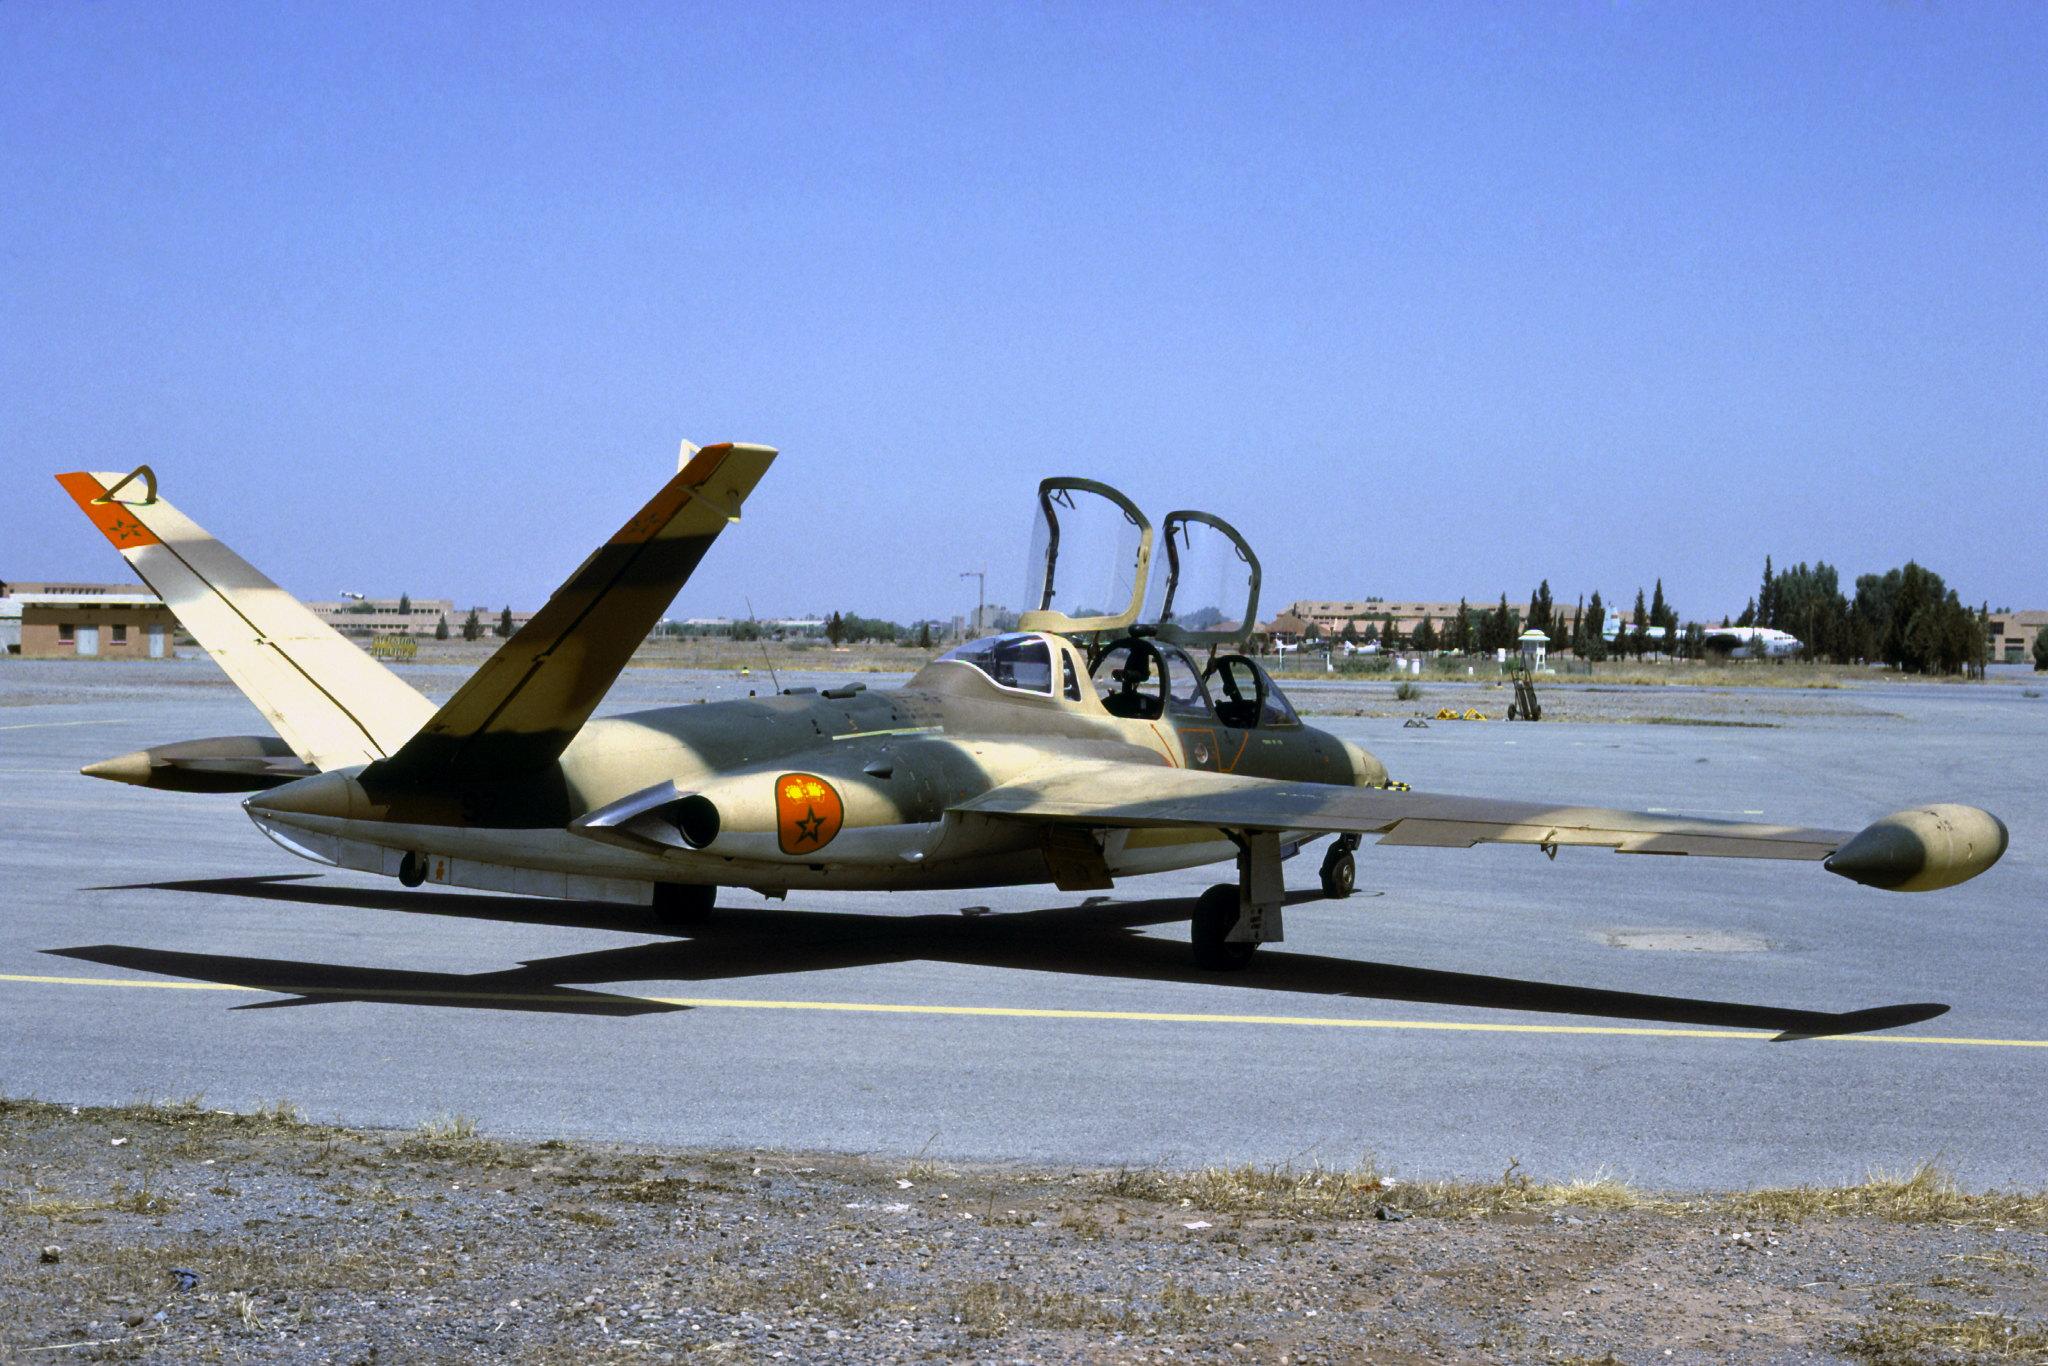 FRA: Photos anciens avions des FRA - Page 13 49404970813_cbbba639ea_k